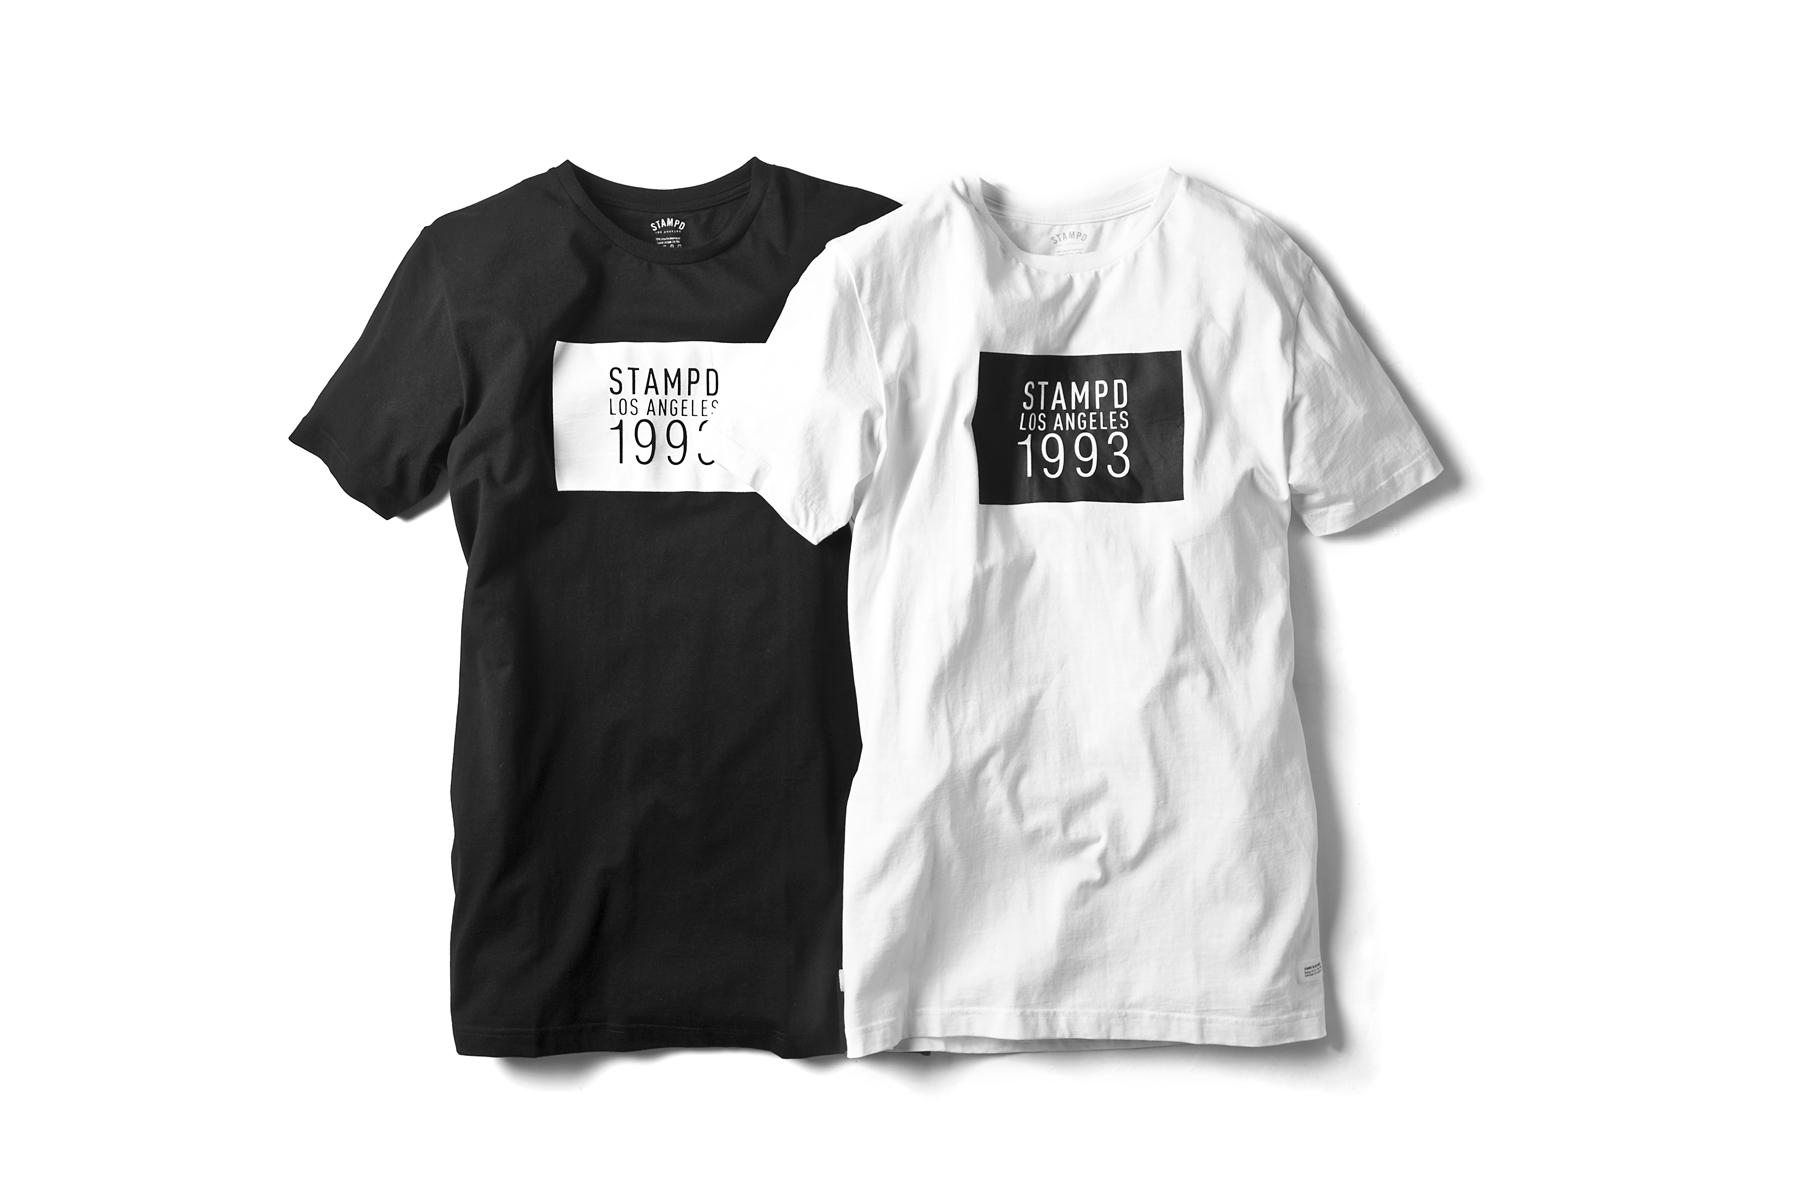 Stampd 2014 Spring/Summer T-Shirts